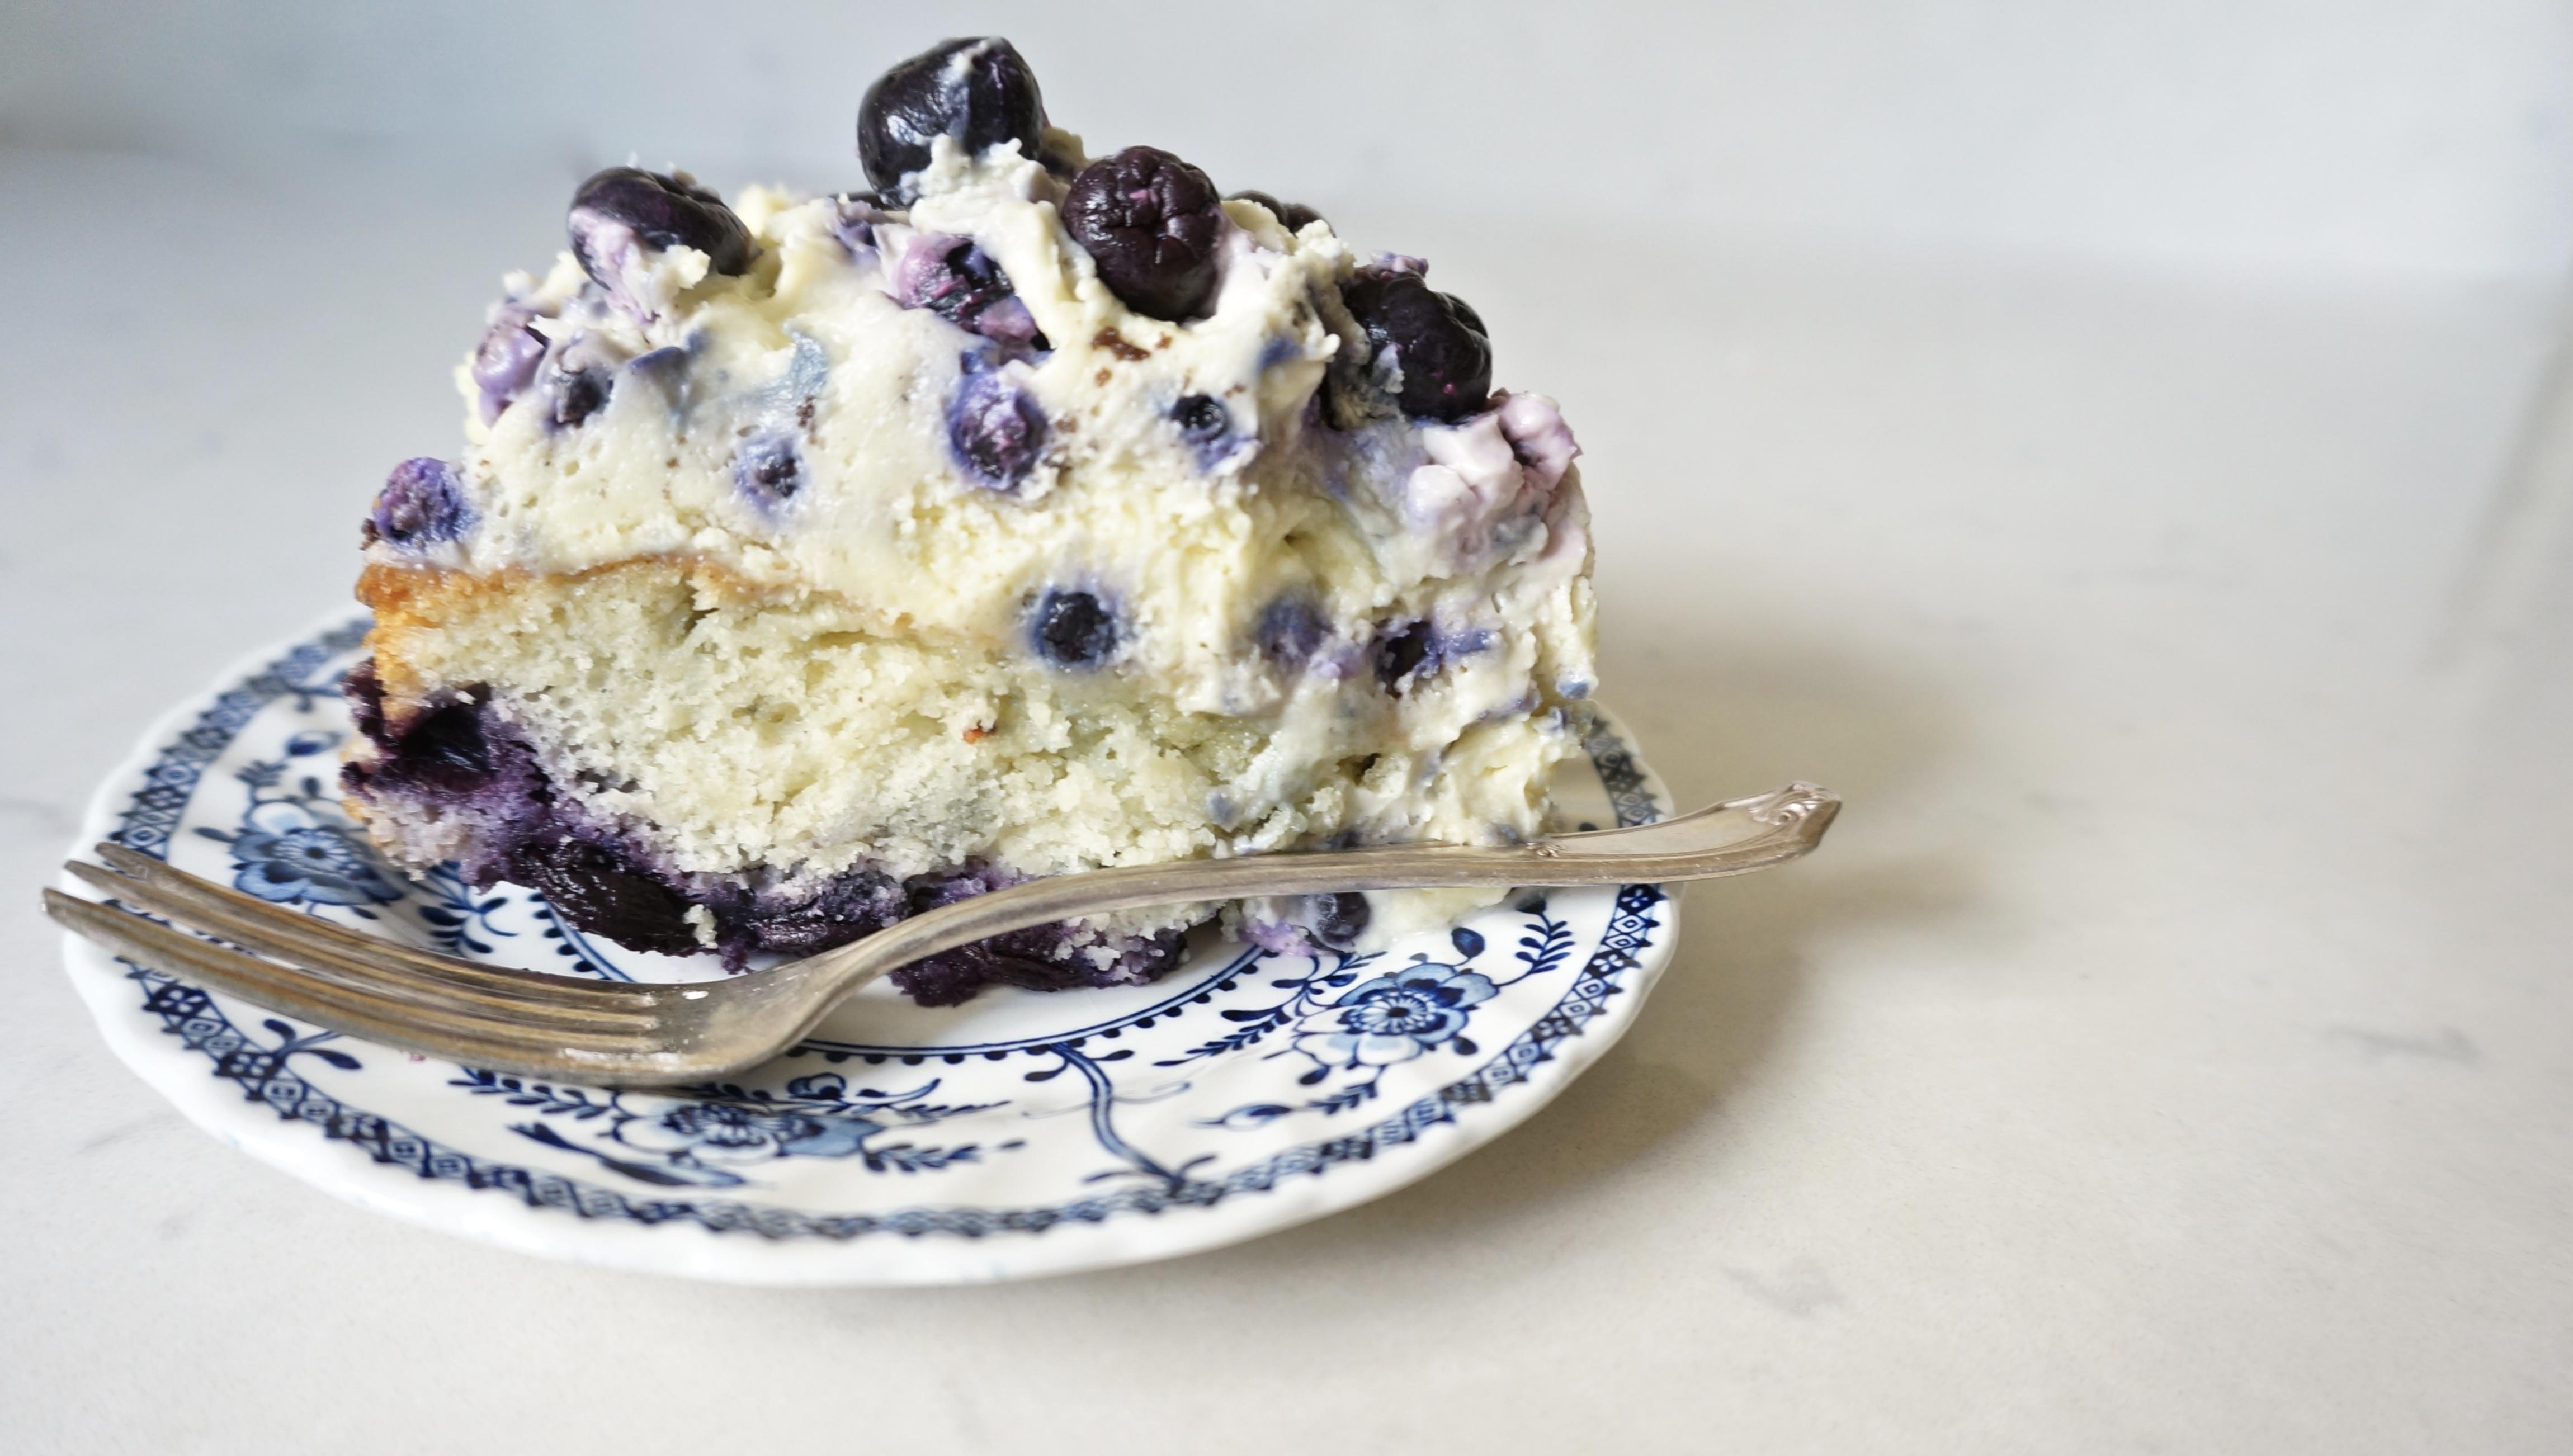 Blueberry Cream Cake | The Thankful Heart